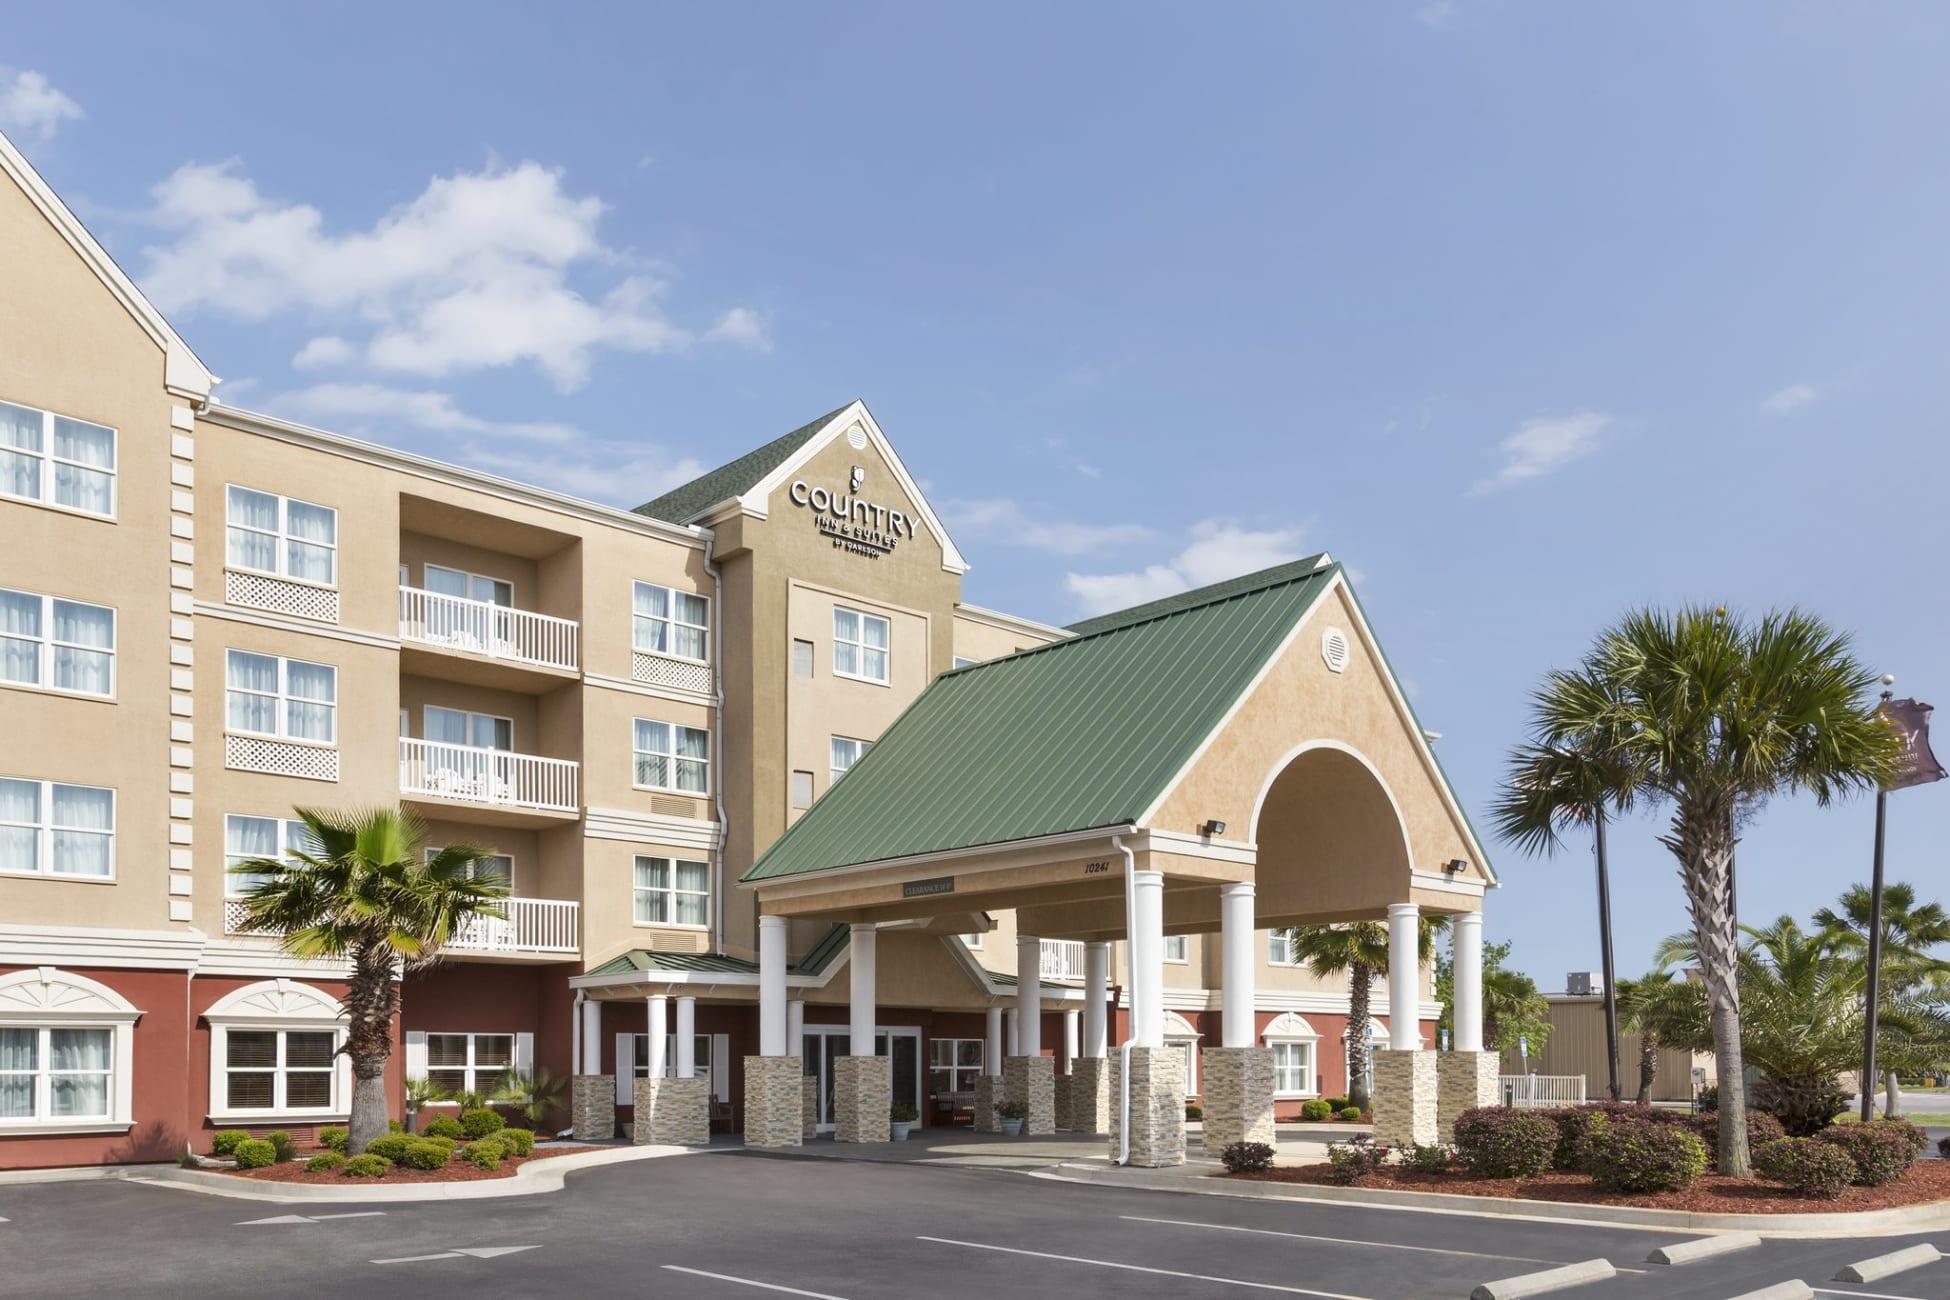 Country Inn & Suitesradisson, Panama City Beach, Fl, Florida - Country Inn And Suites Florida Map